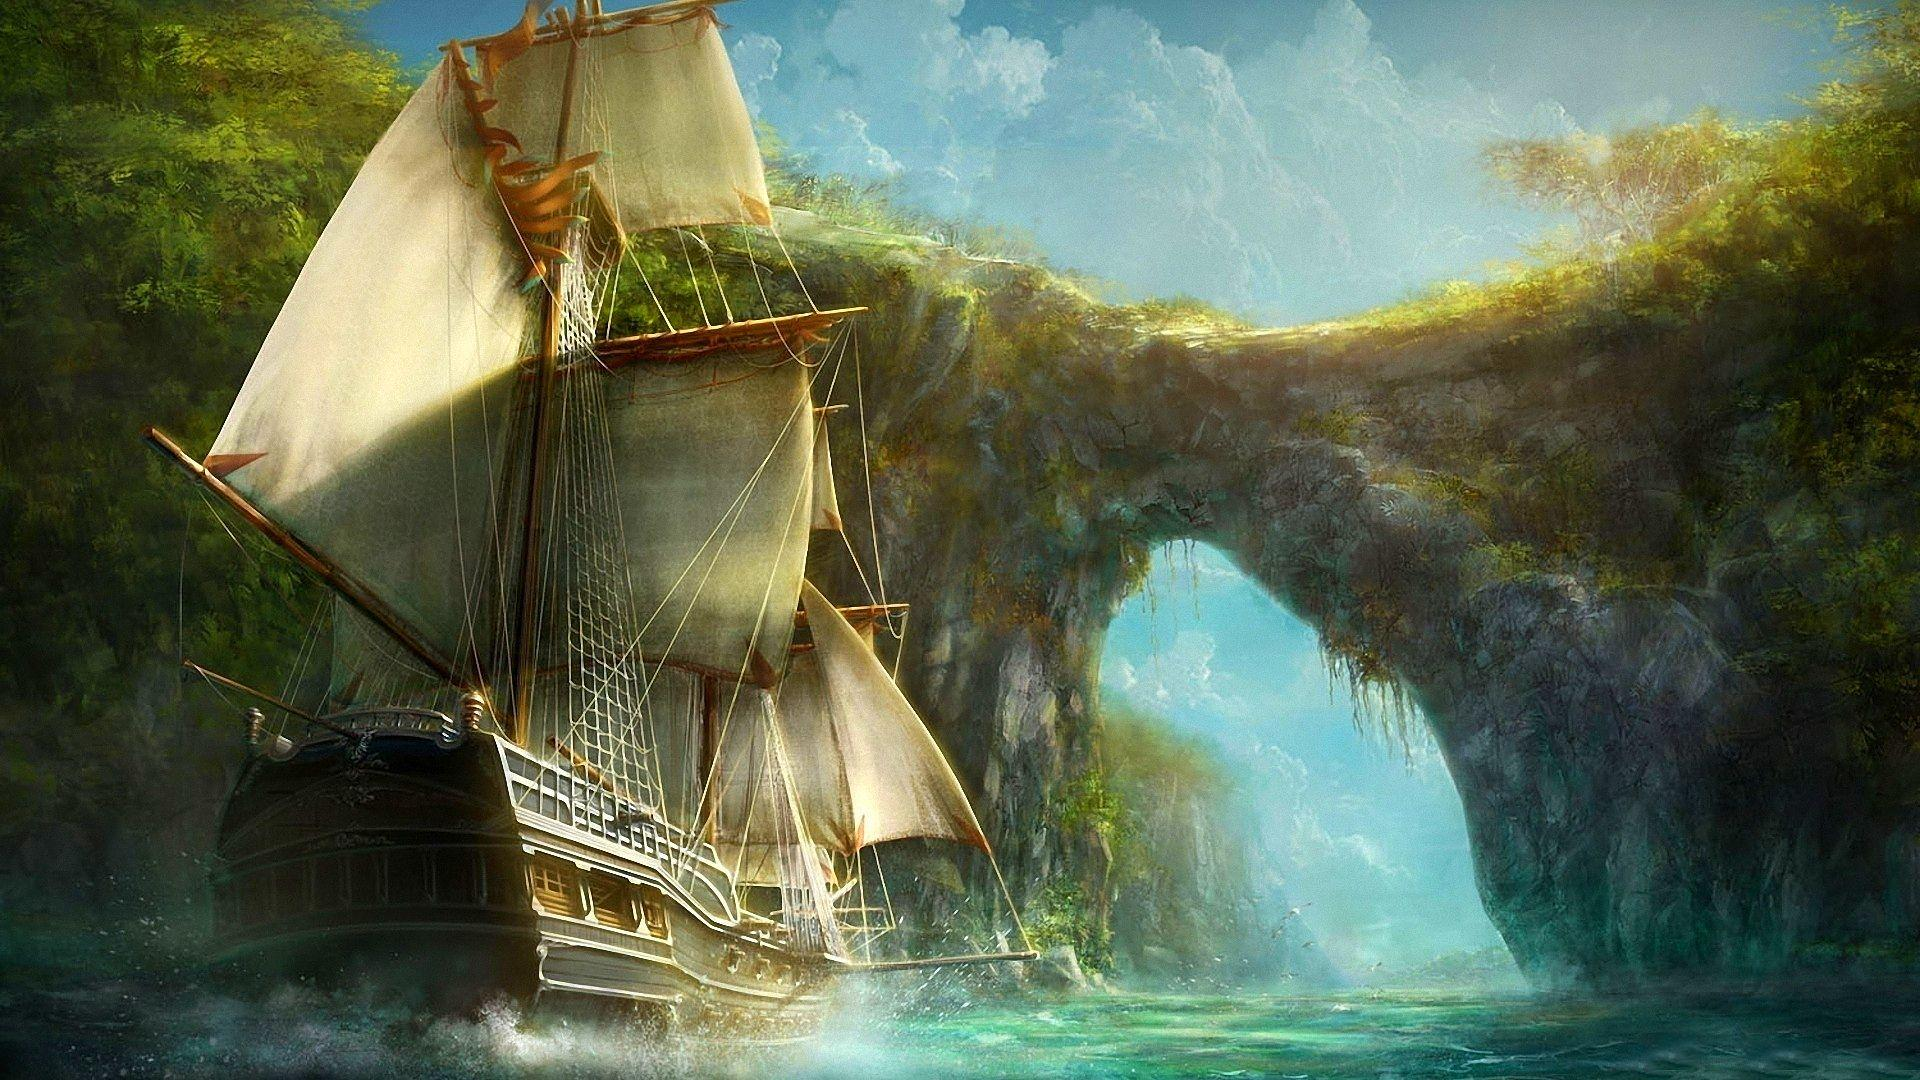 Wallpapers pirate ship hd magical 1920x1080 1628660 pirate ship